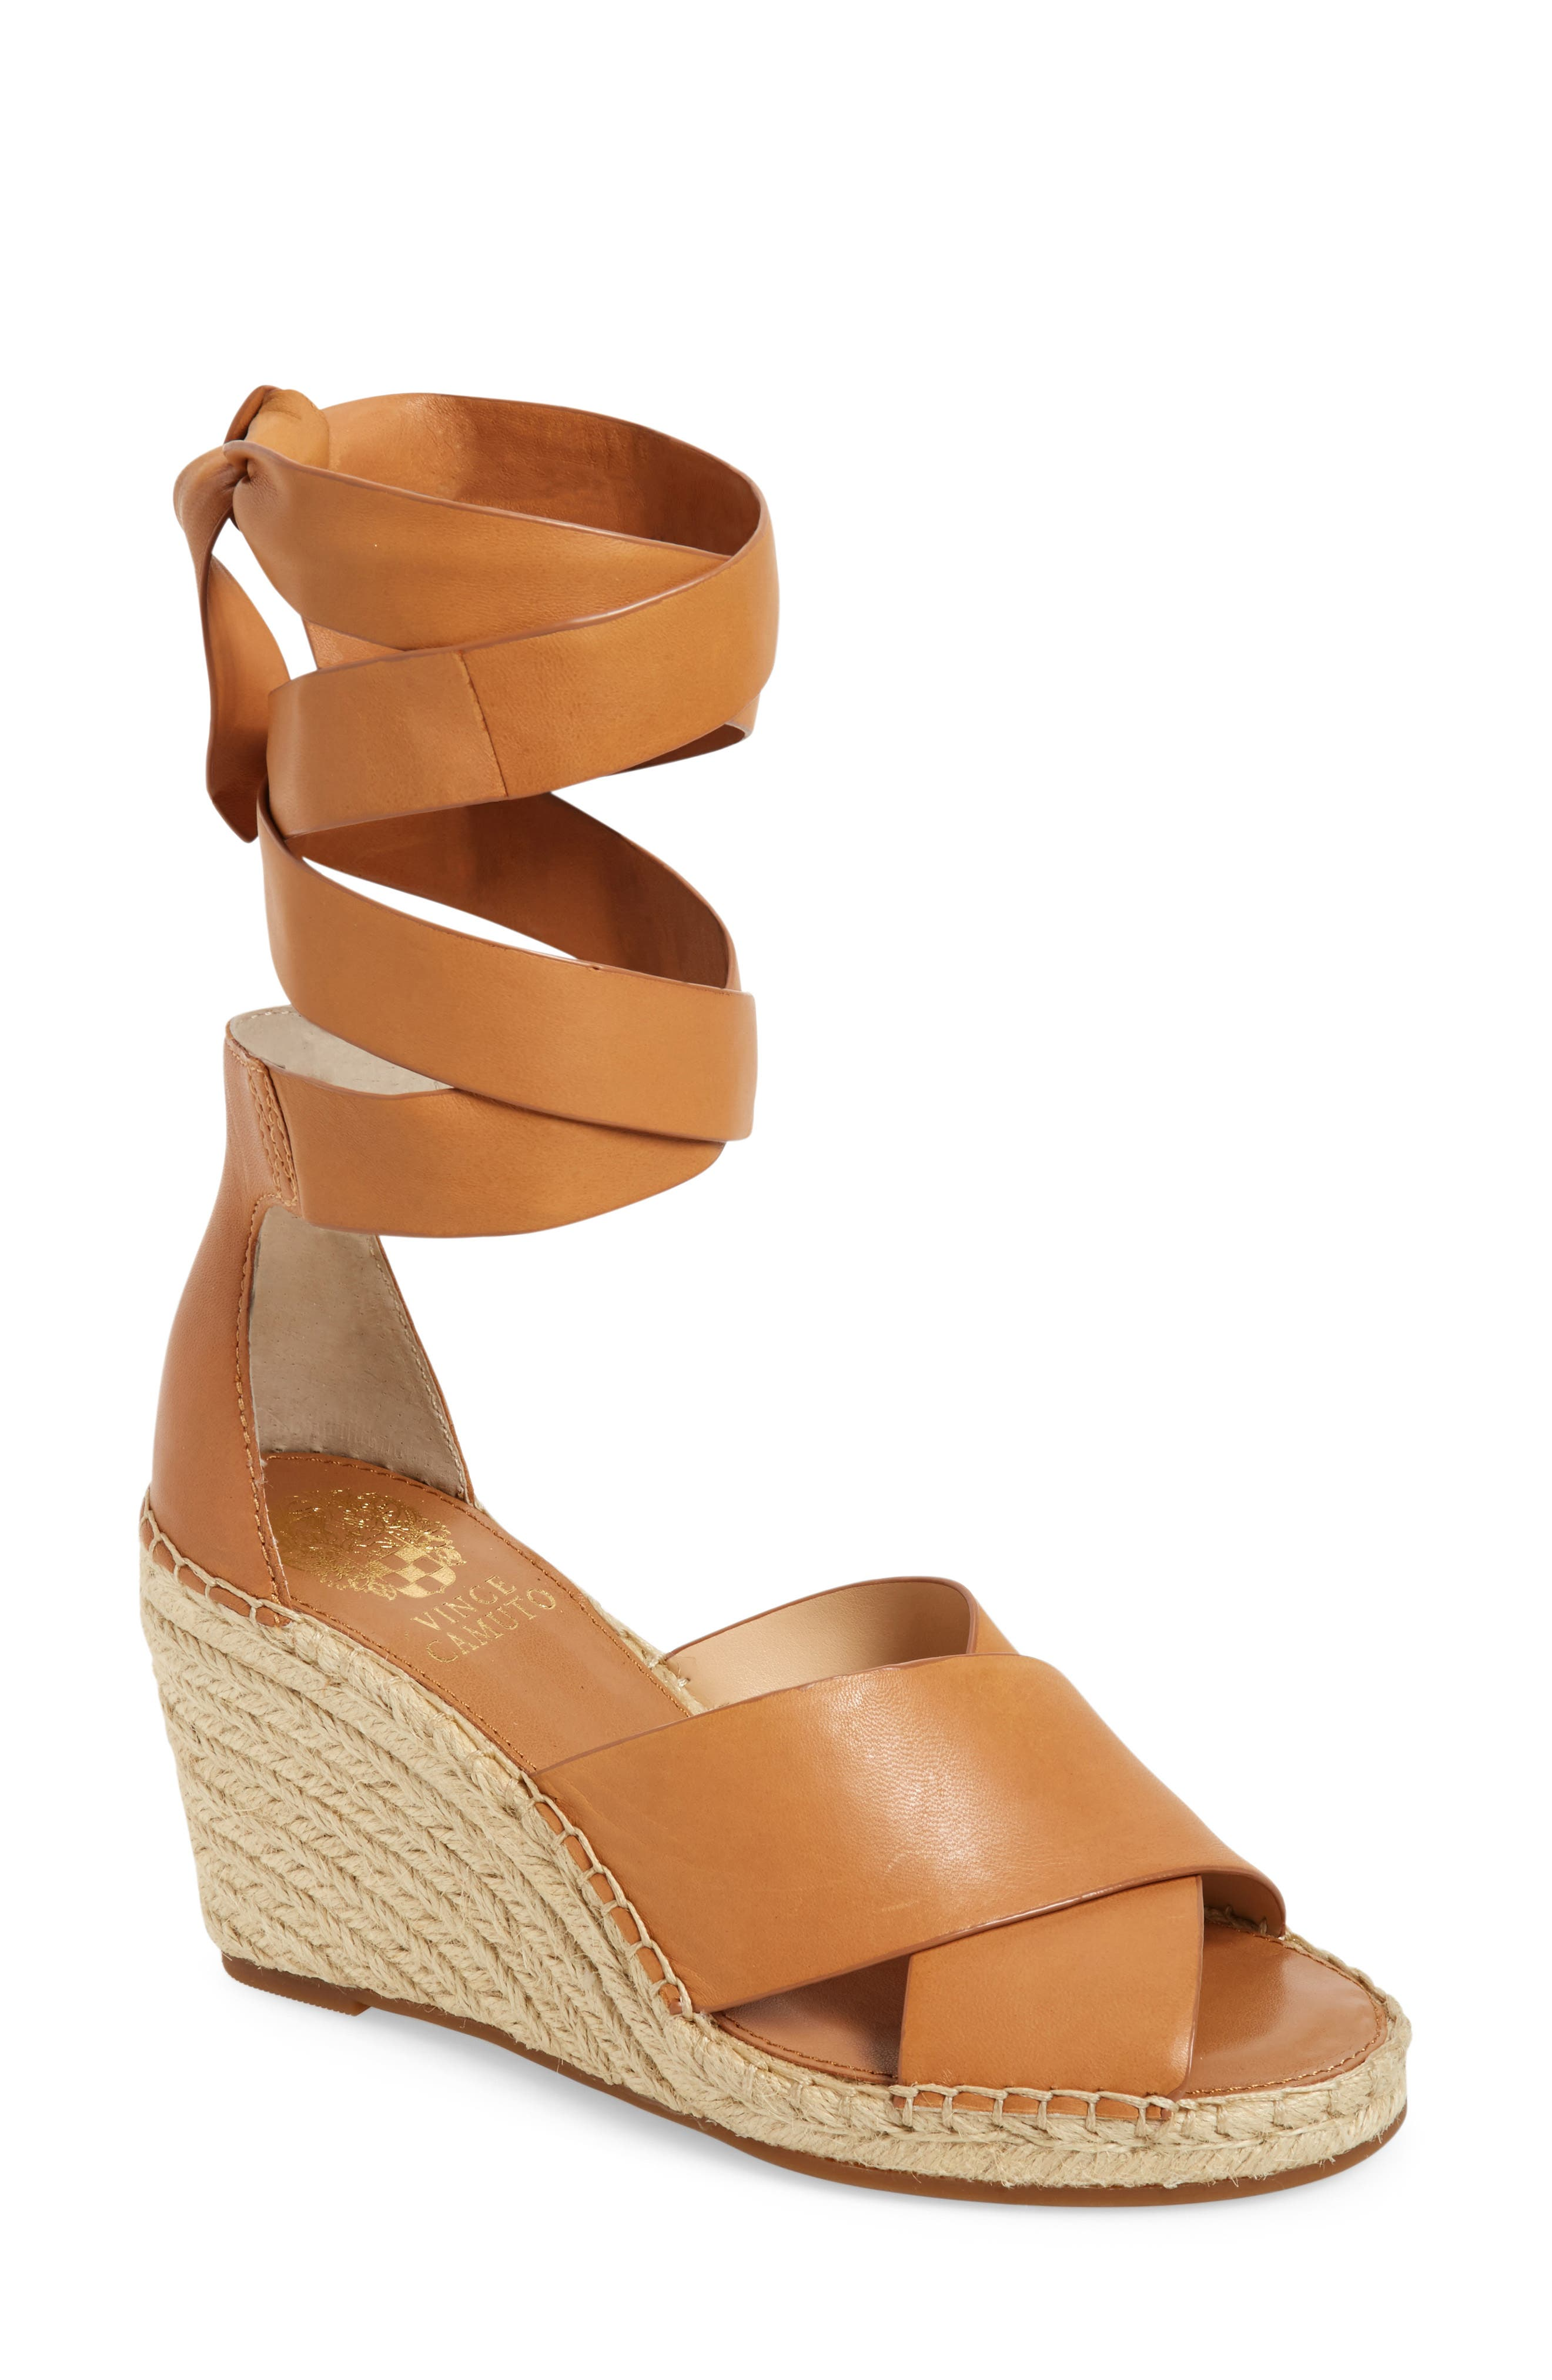 Vince Camuto Leddy Wedge Sandal (Women)